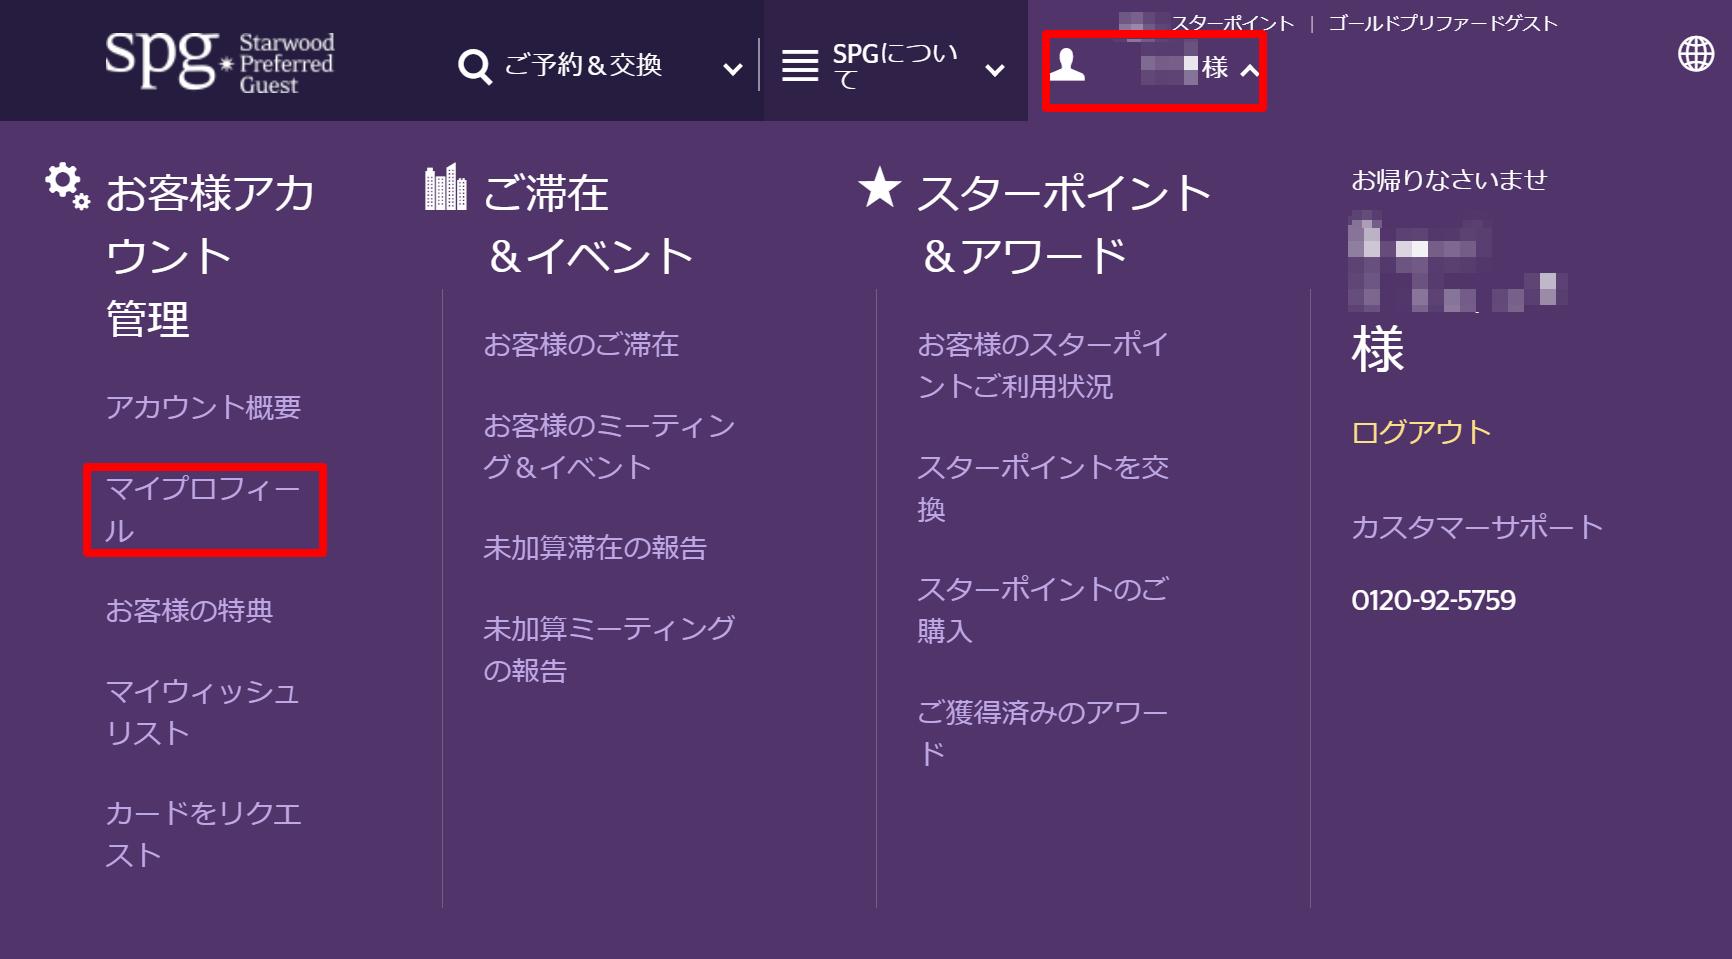 SPG会員登録10